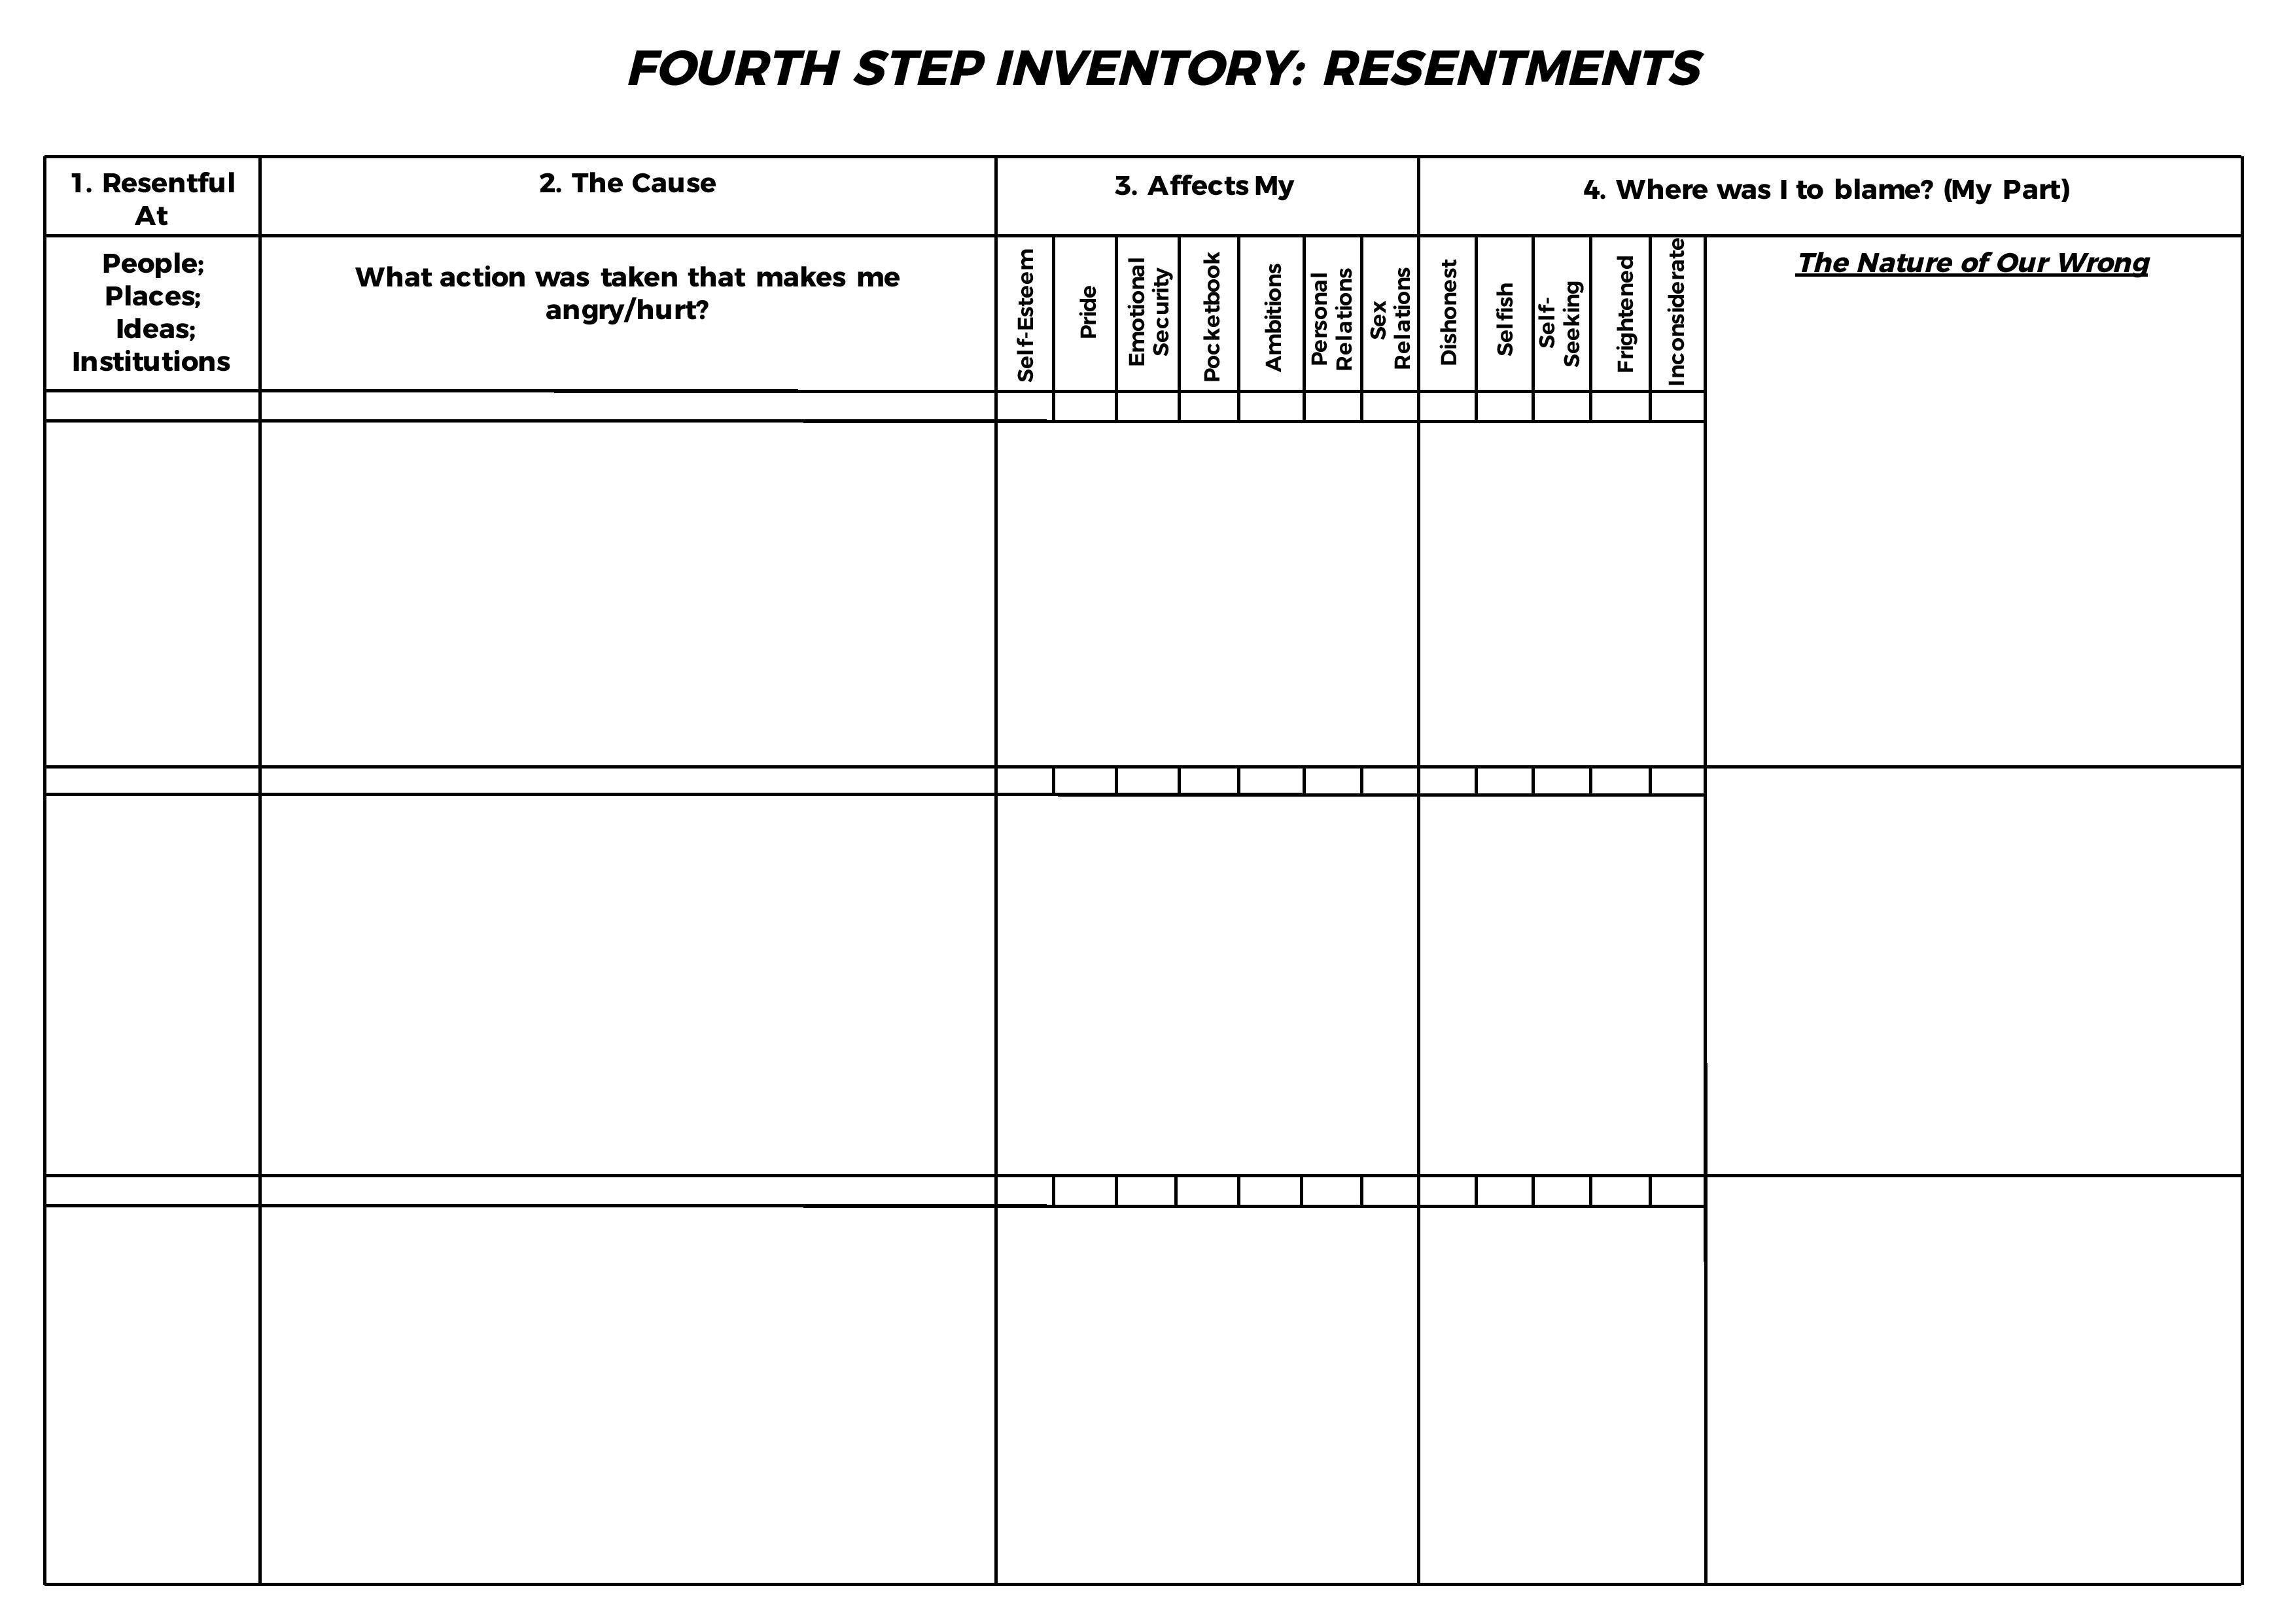 Hazelden 4th Step Worksheet